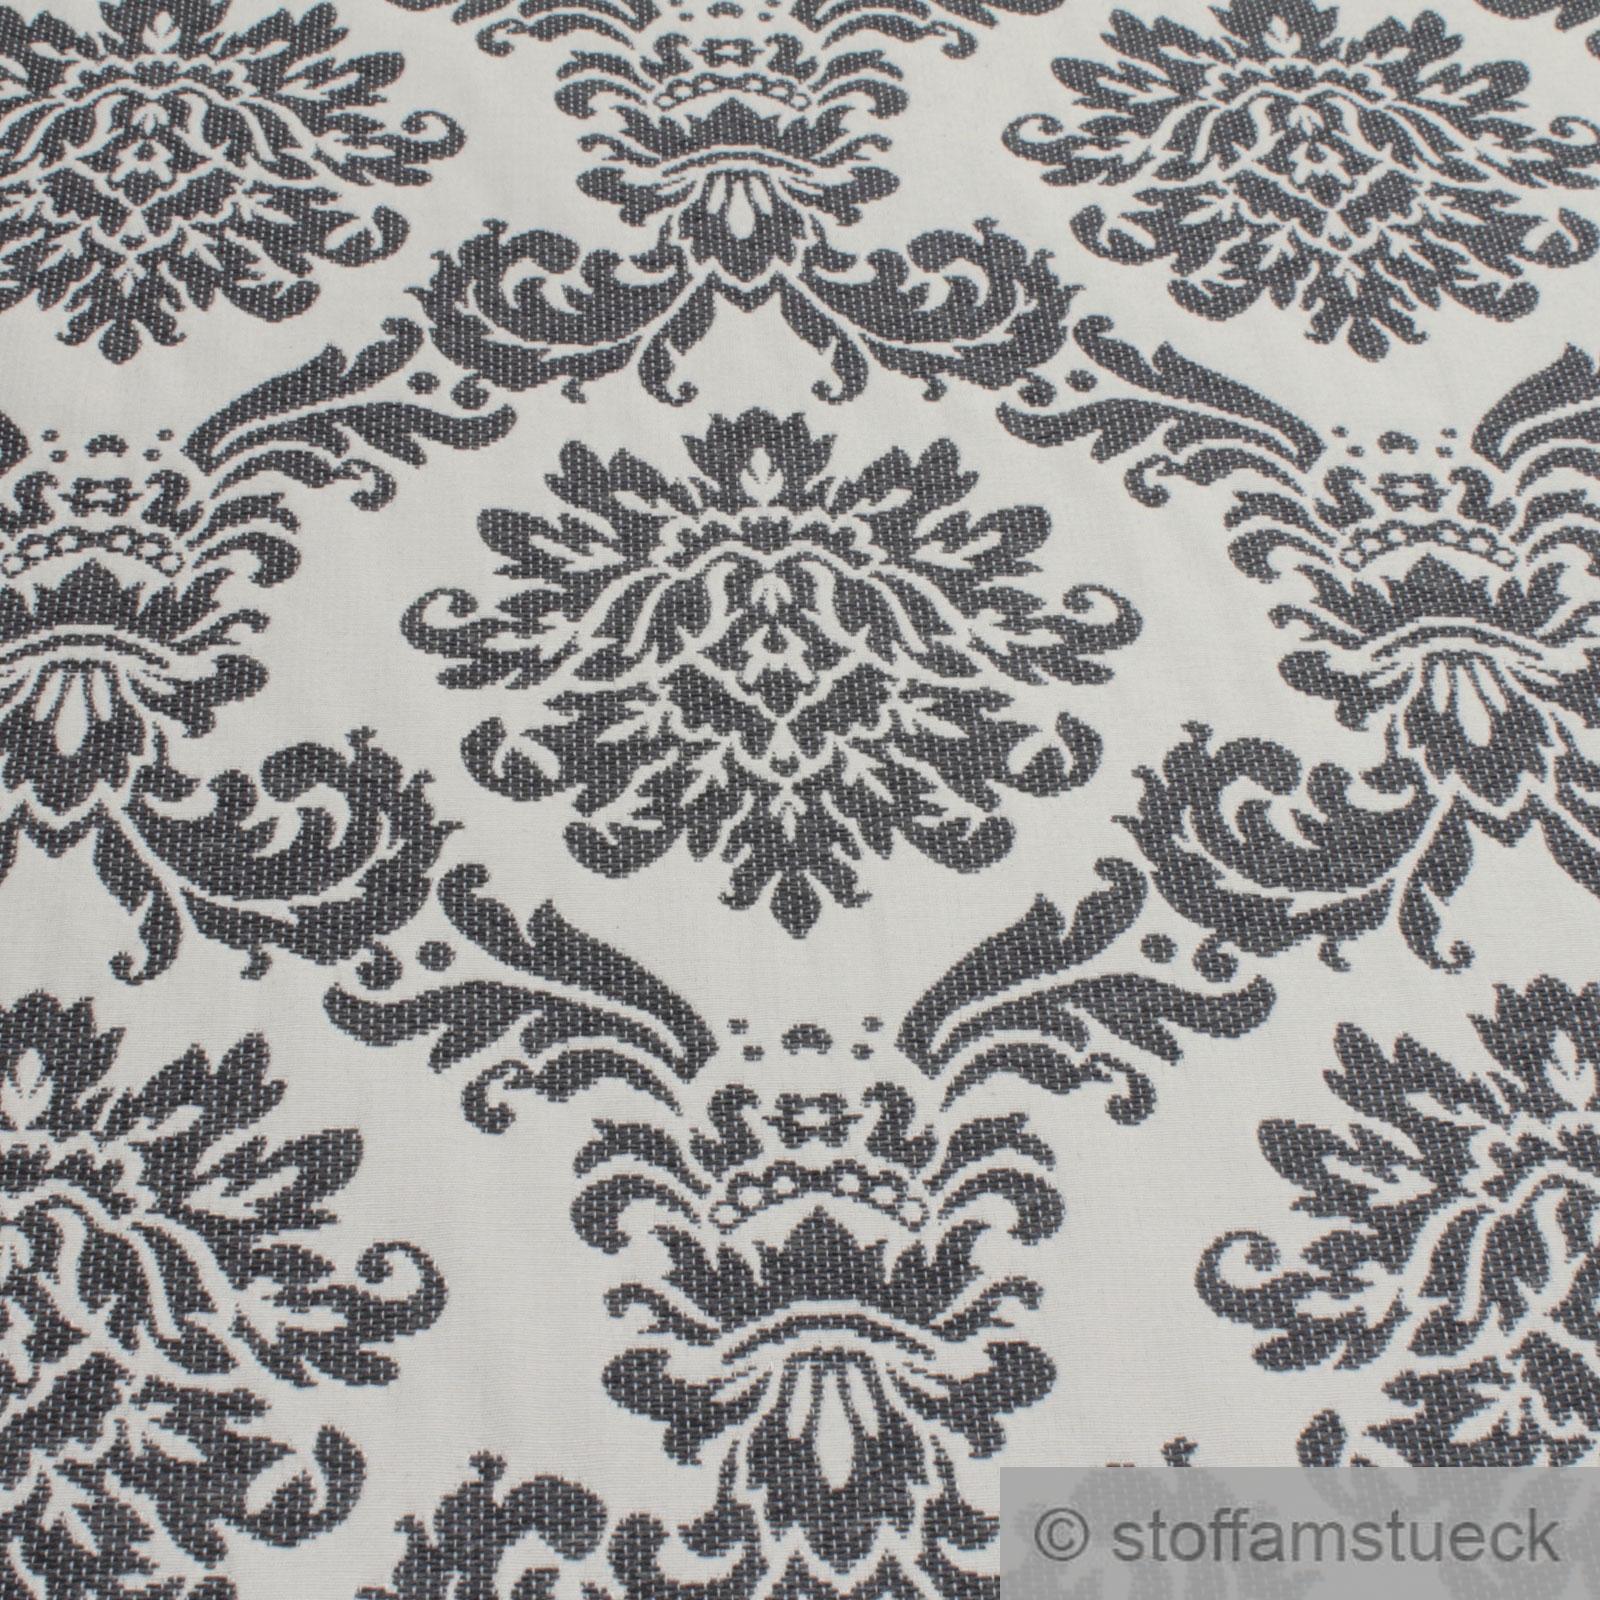 Basteln Malen Nähen Stoff Polyester Baumwolle Jacquard